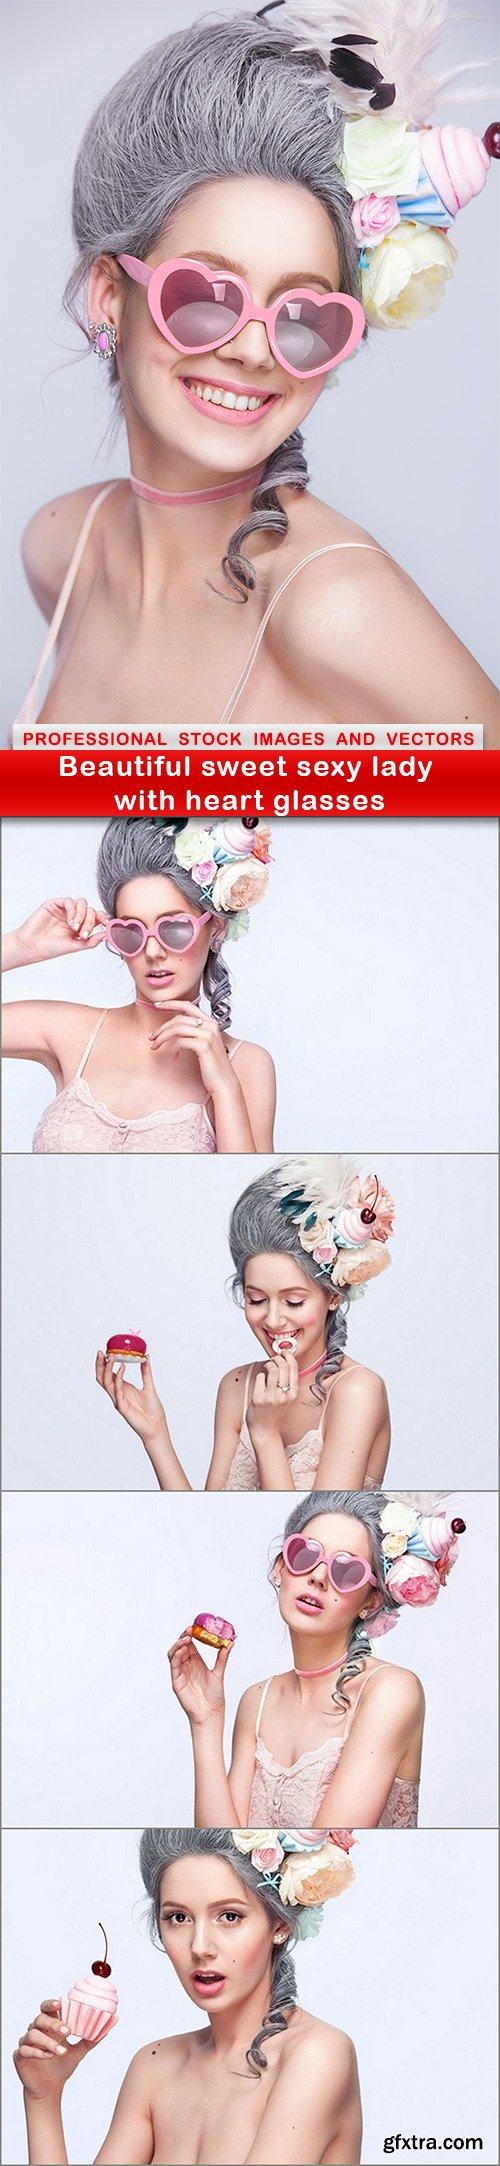 Beautiful sweet sexy lady with heart glasses - 5 UHQ JPEG